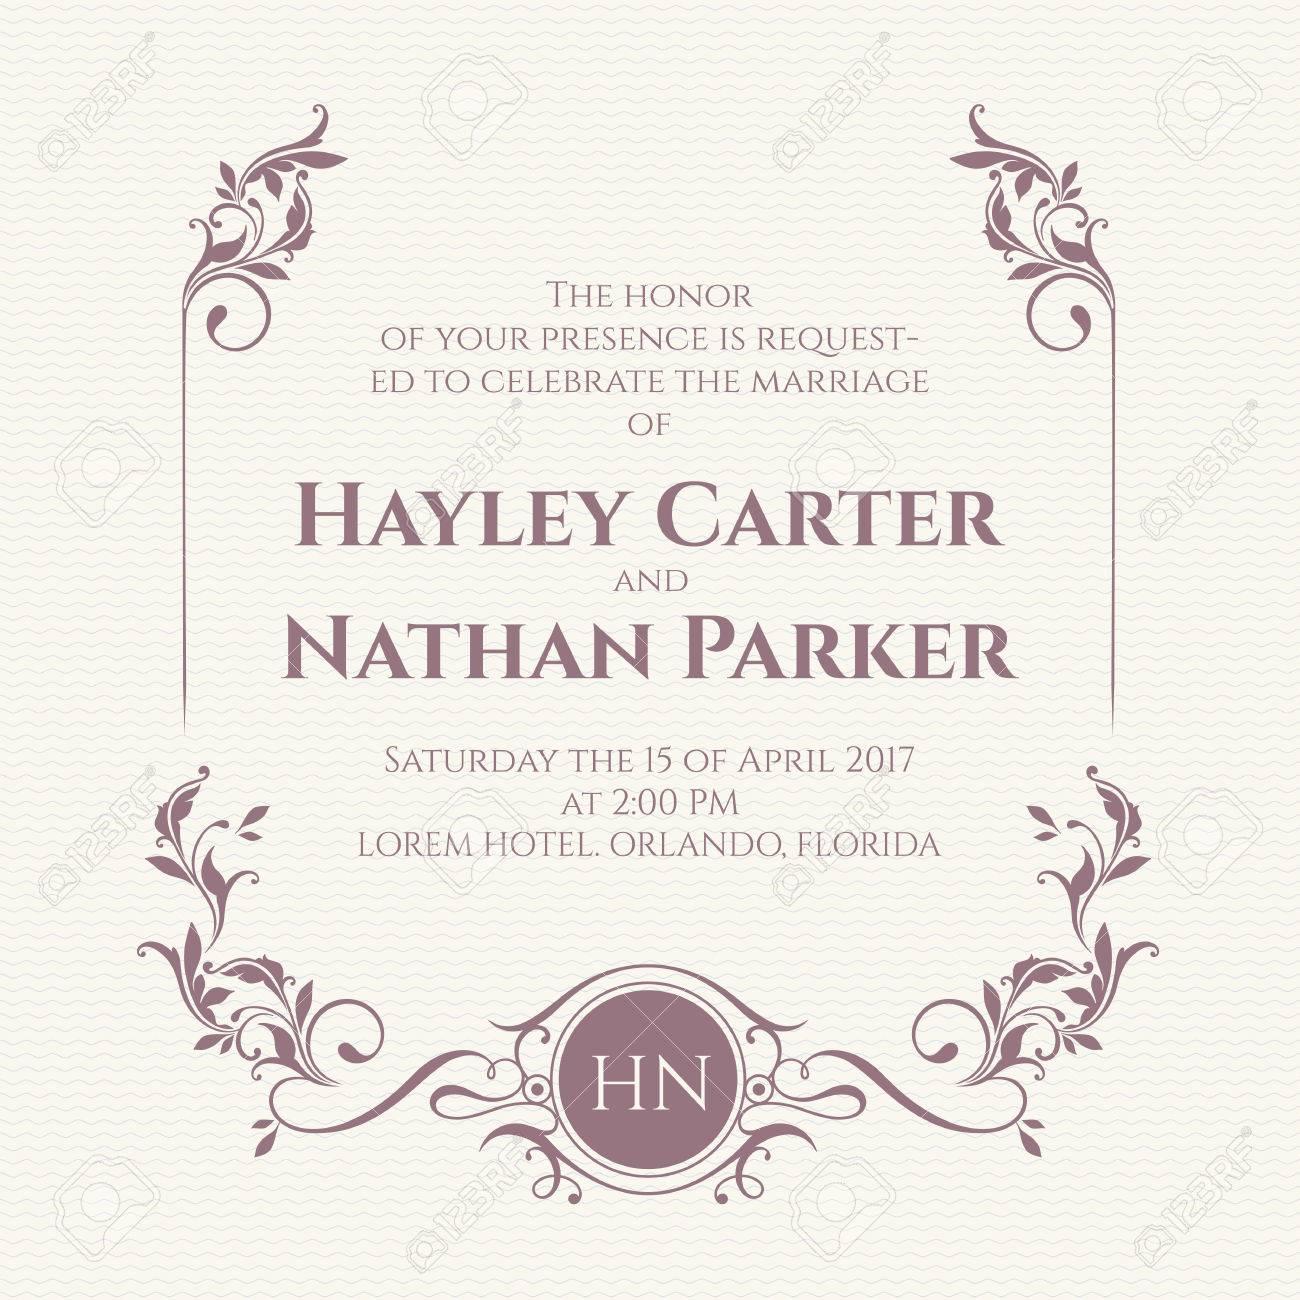 Graphic Design Page. Wedding Invitation. Decorative Floral Frame ...